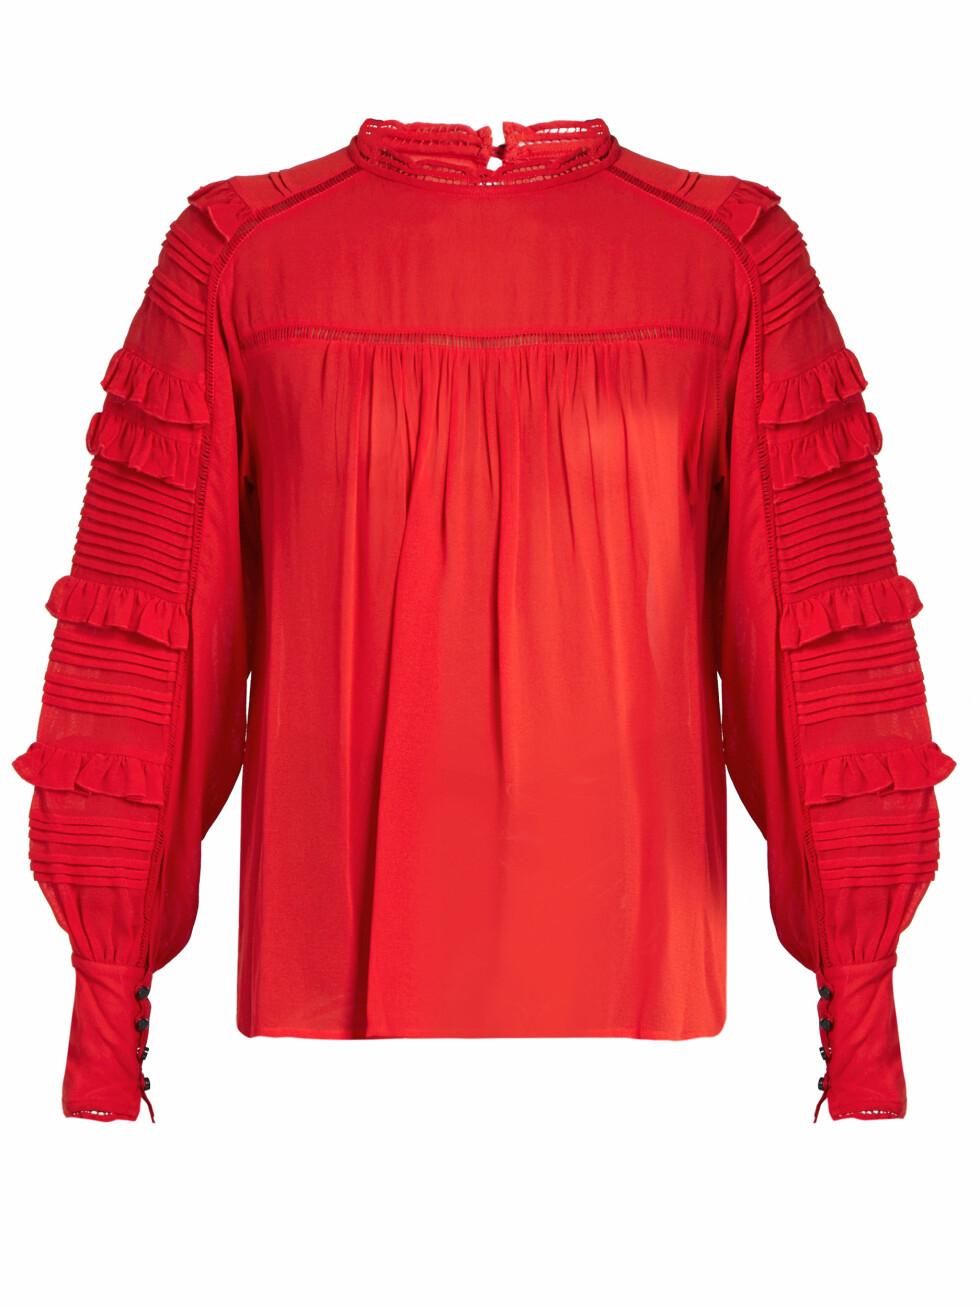 Overdel fra Isabel Marant via Matchesfashion.com | kr 3110 | http://www.matchesfashion.com/intl/products/Isabel-Marant-Qimper-silk-blend-and-lace-blouse-1069702